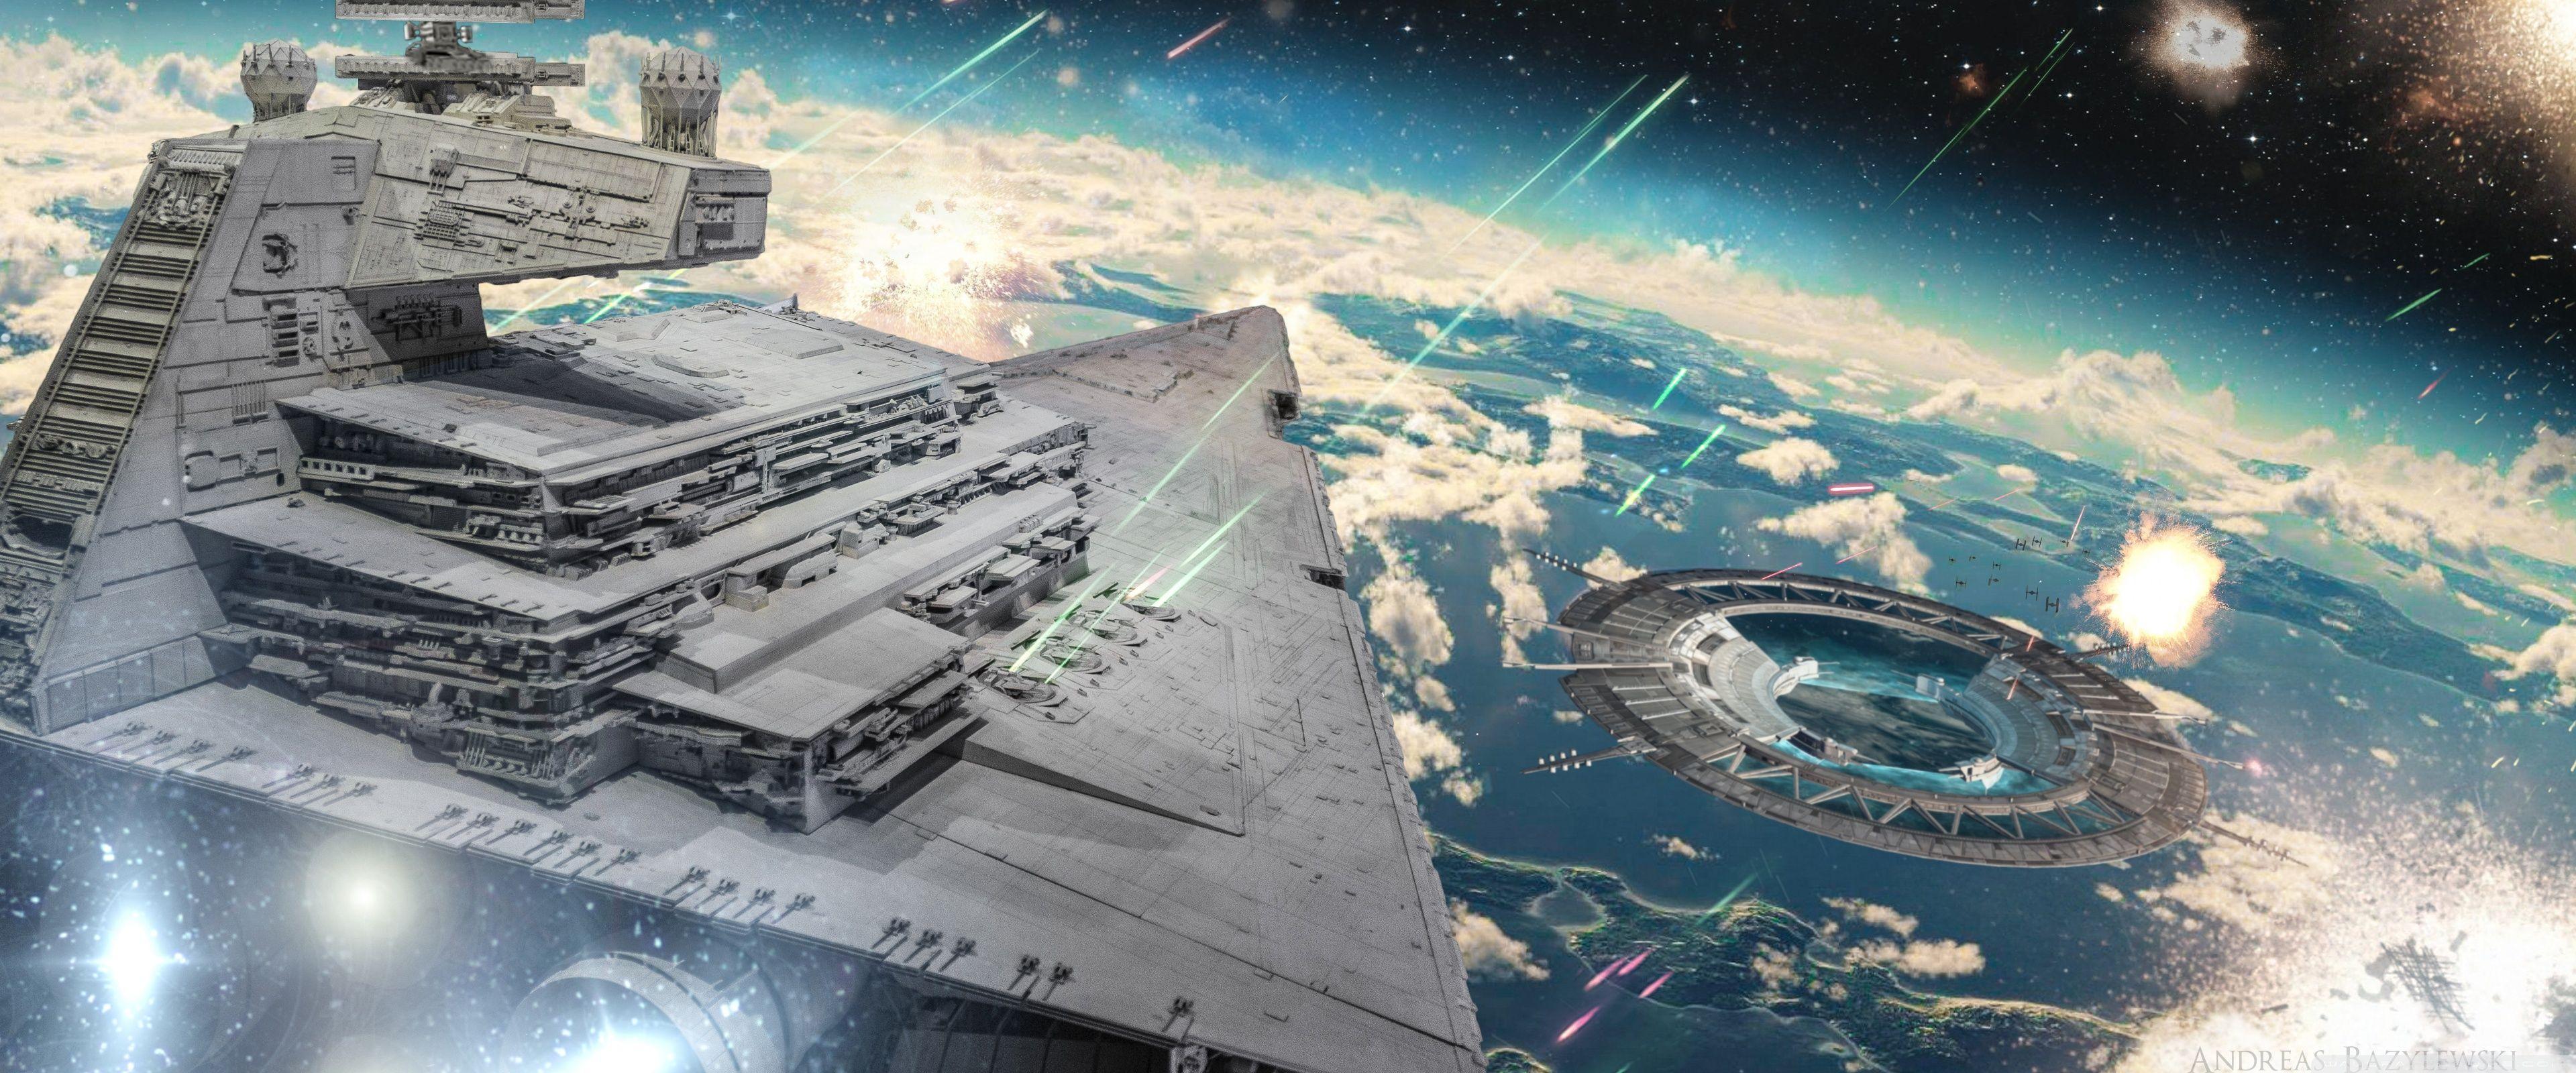 Star Wars Ultra Wide Wallpapers - Top Free Star Wars Ultra